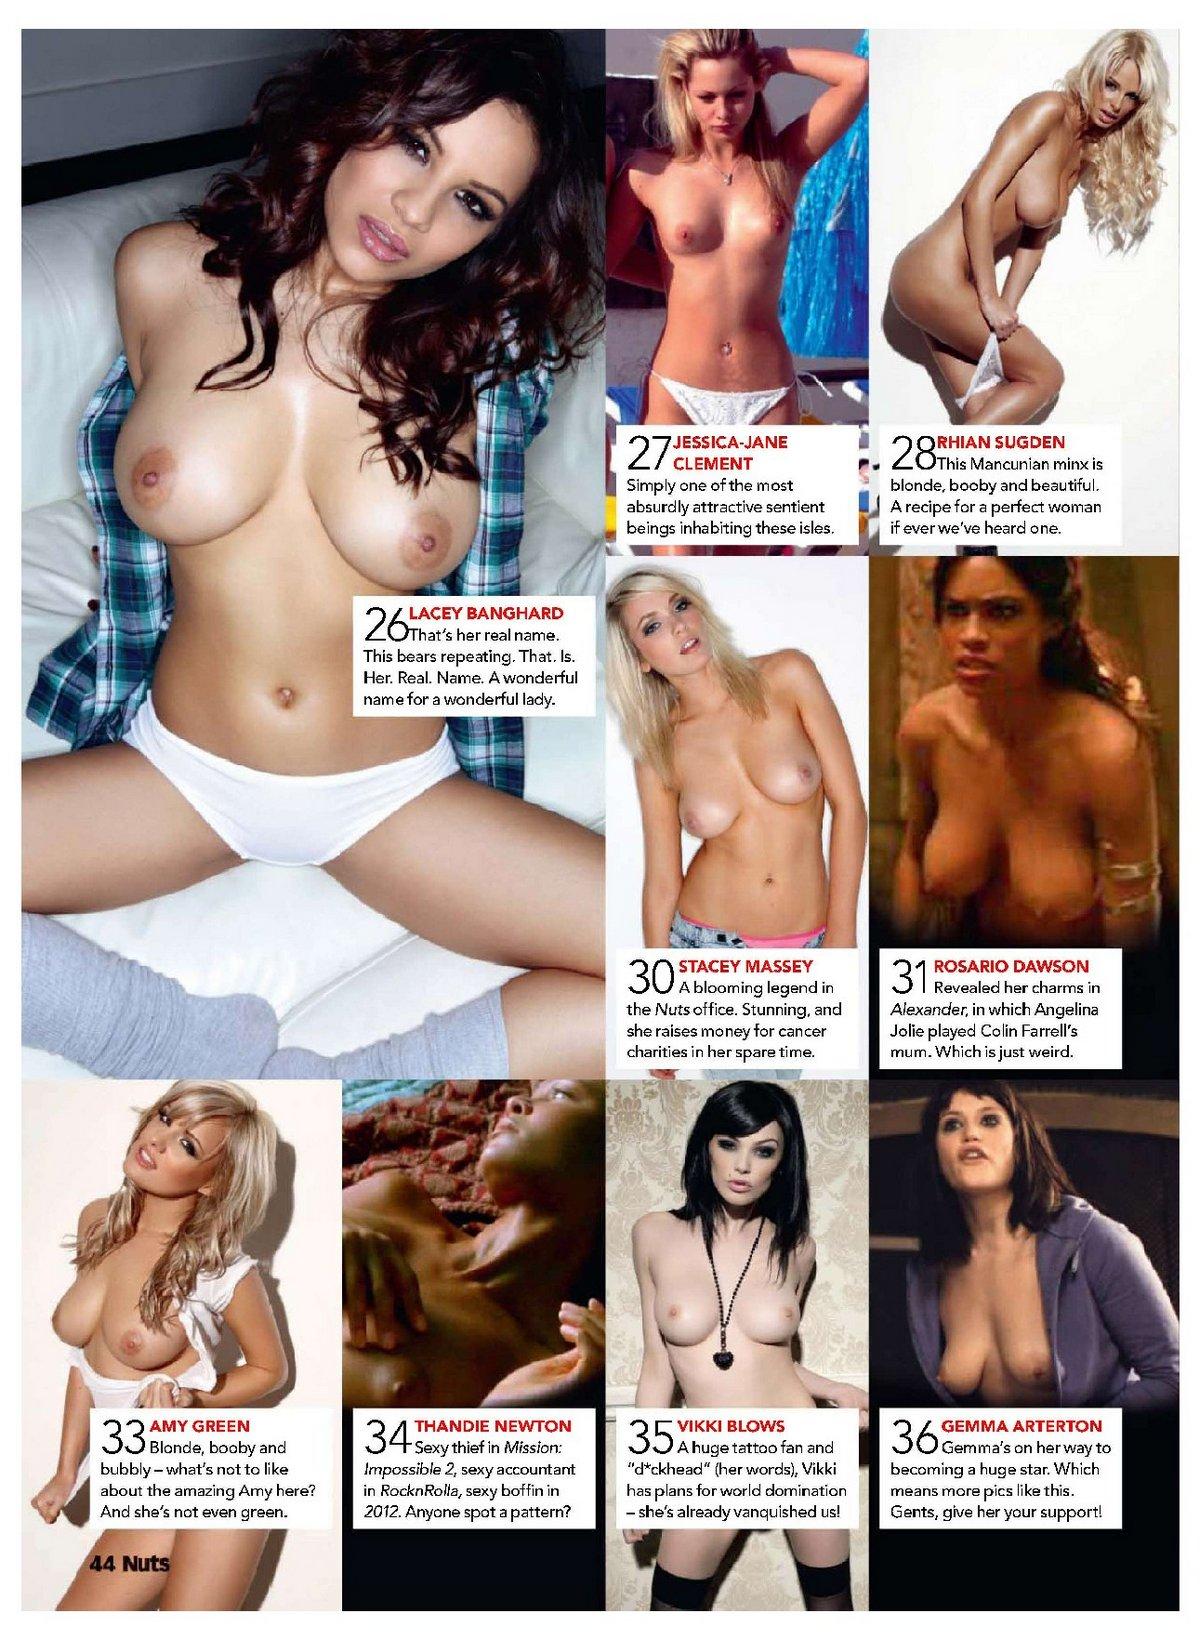 100-luchshih-pornoaktris